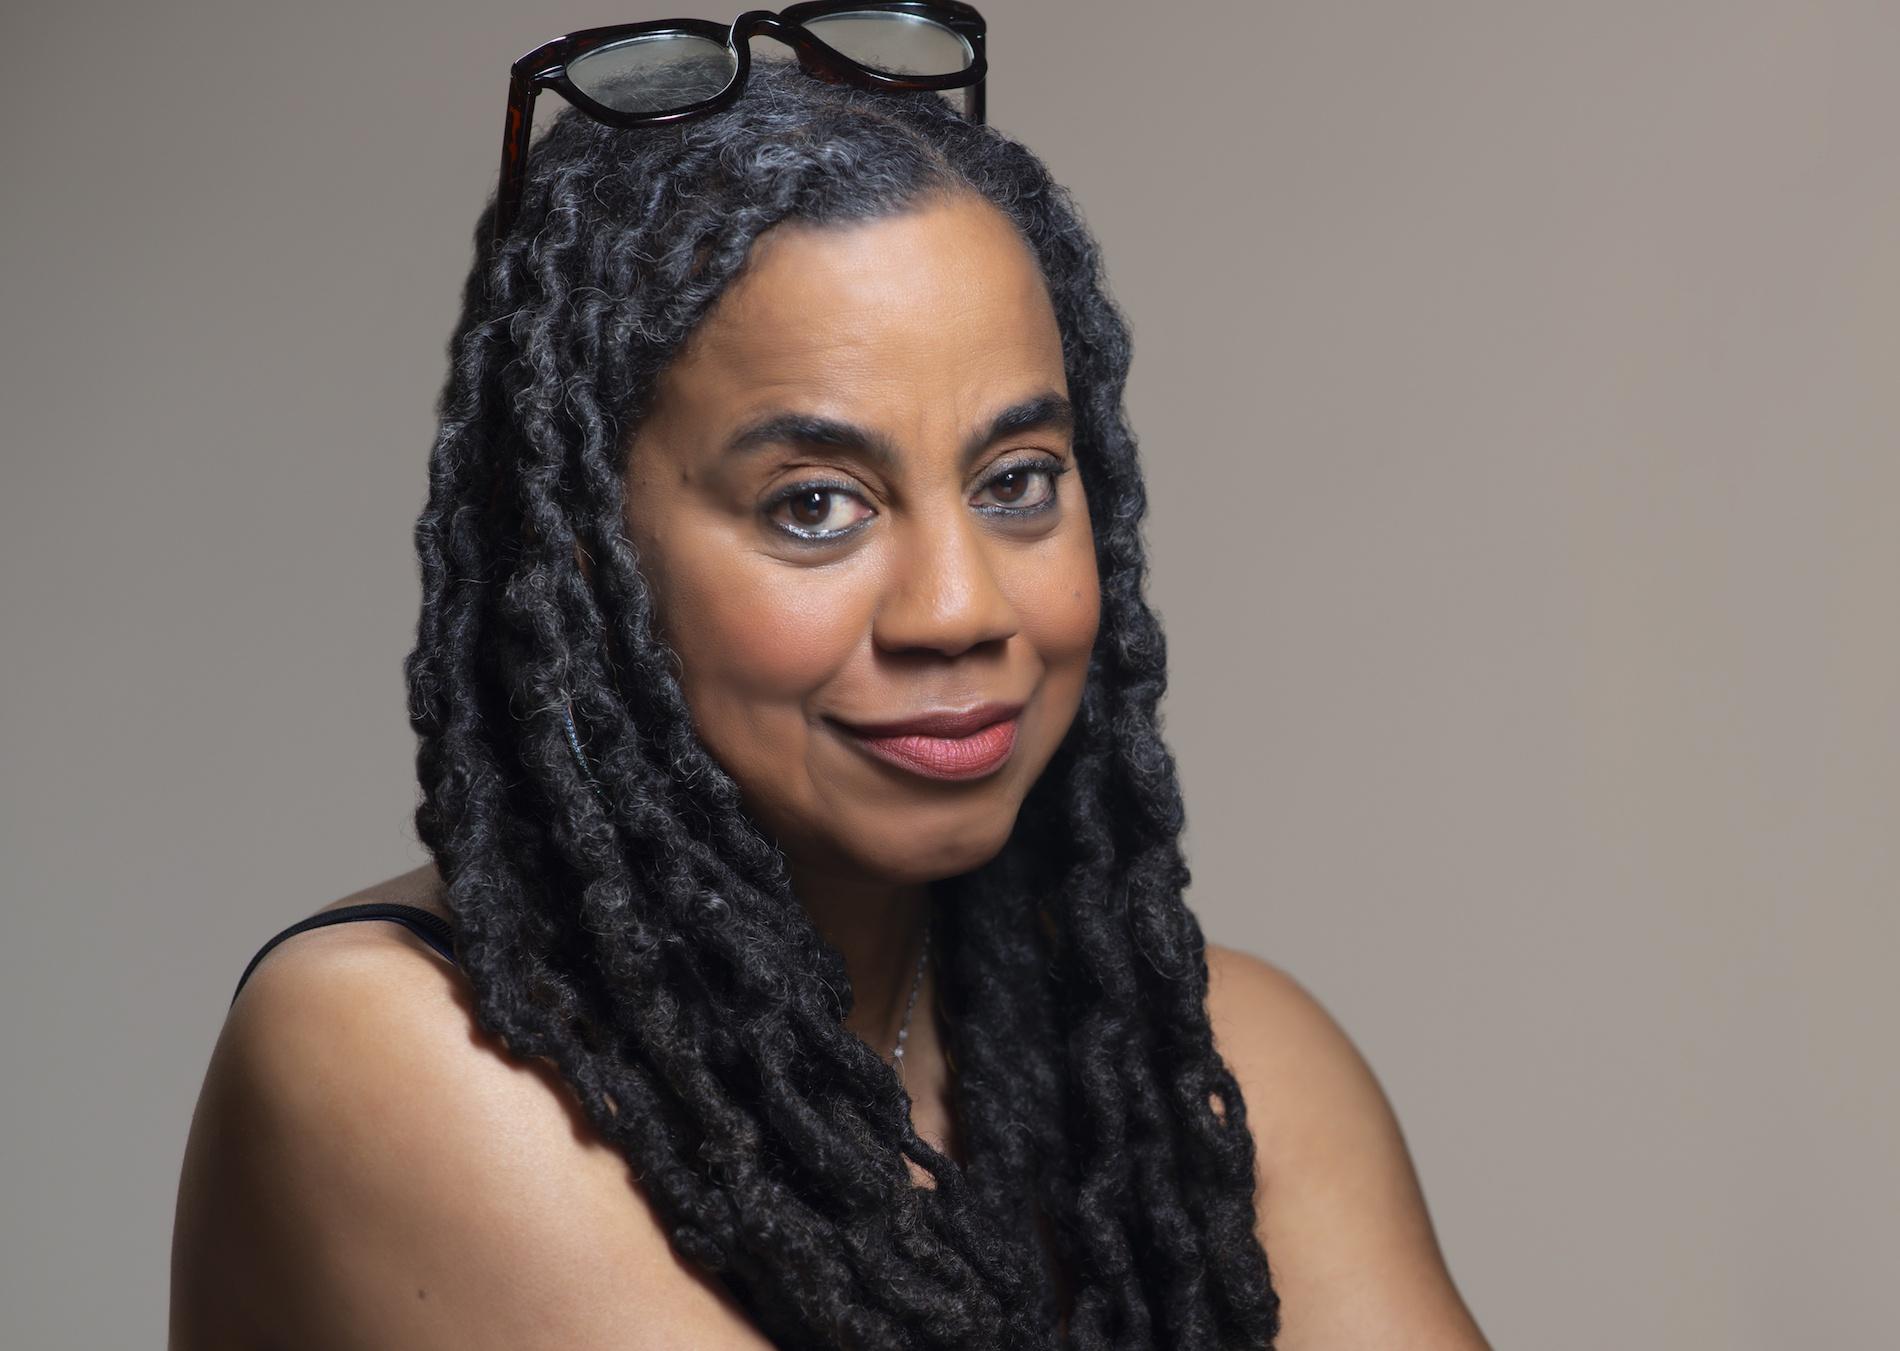 Suzan-Lori Parks Is Redefining 'Genius'